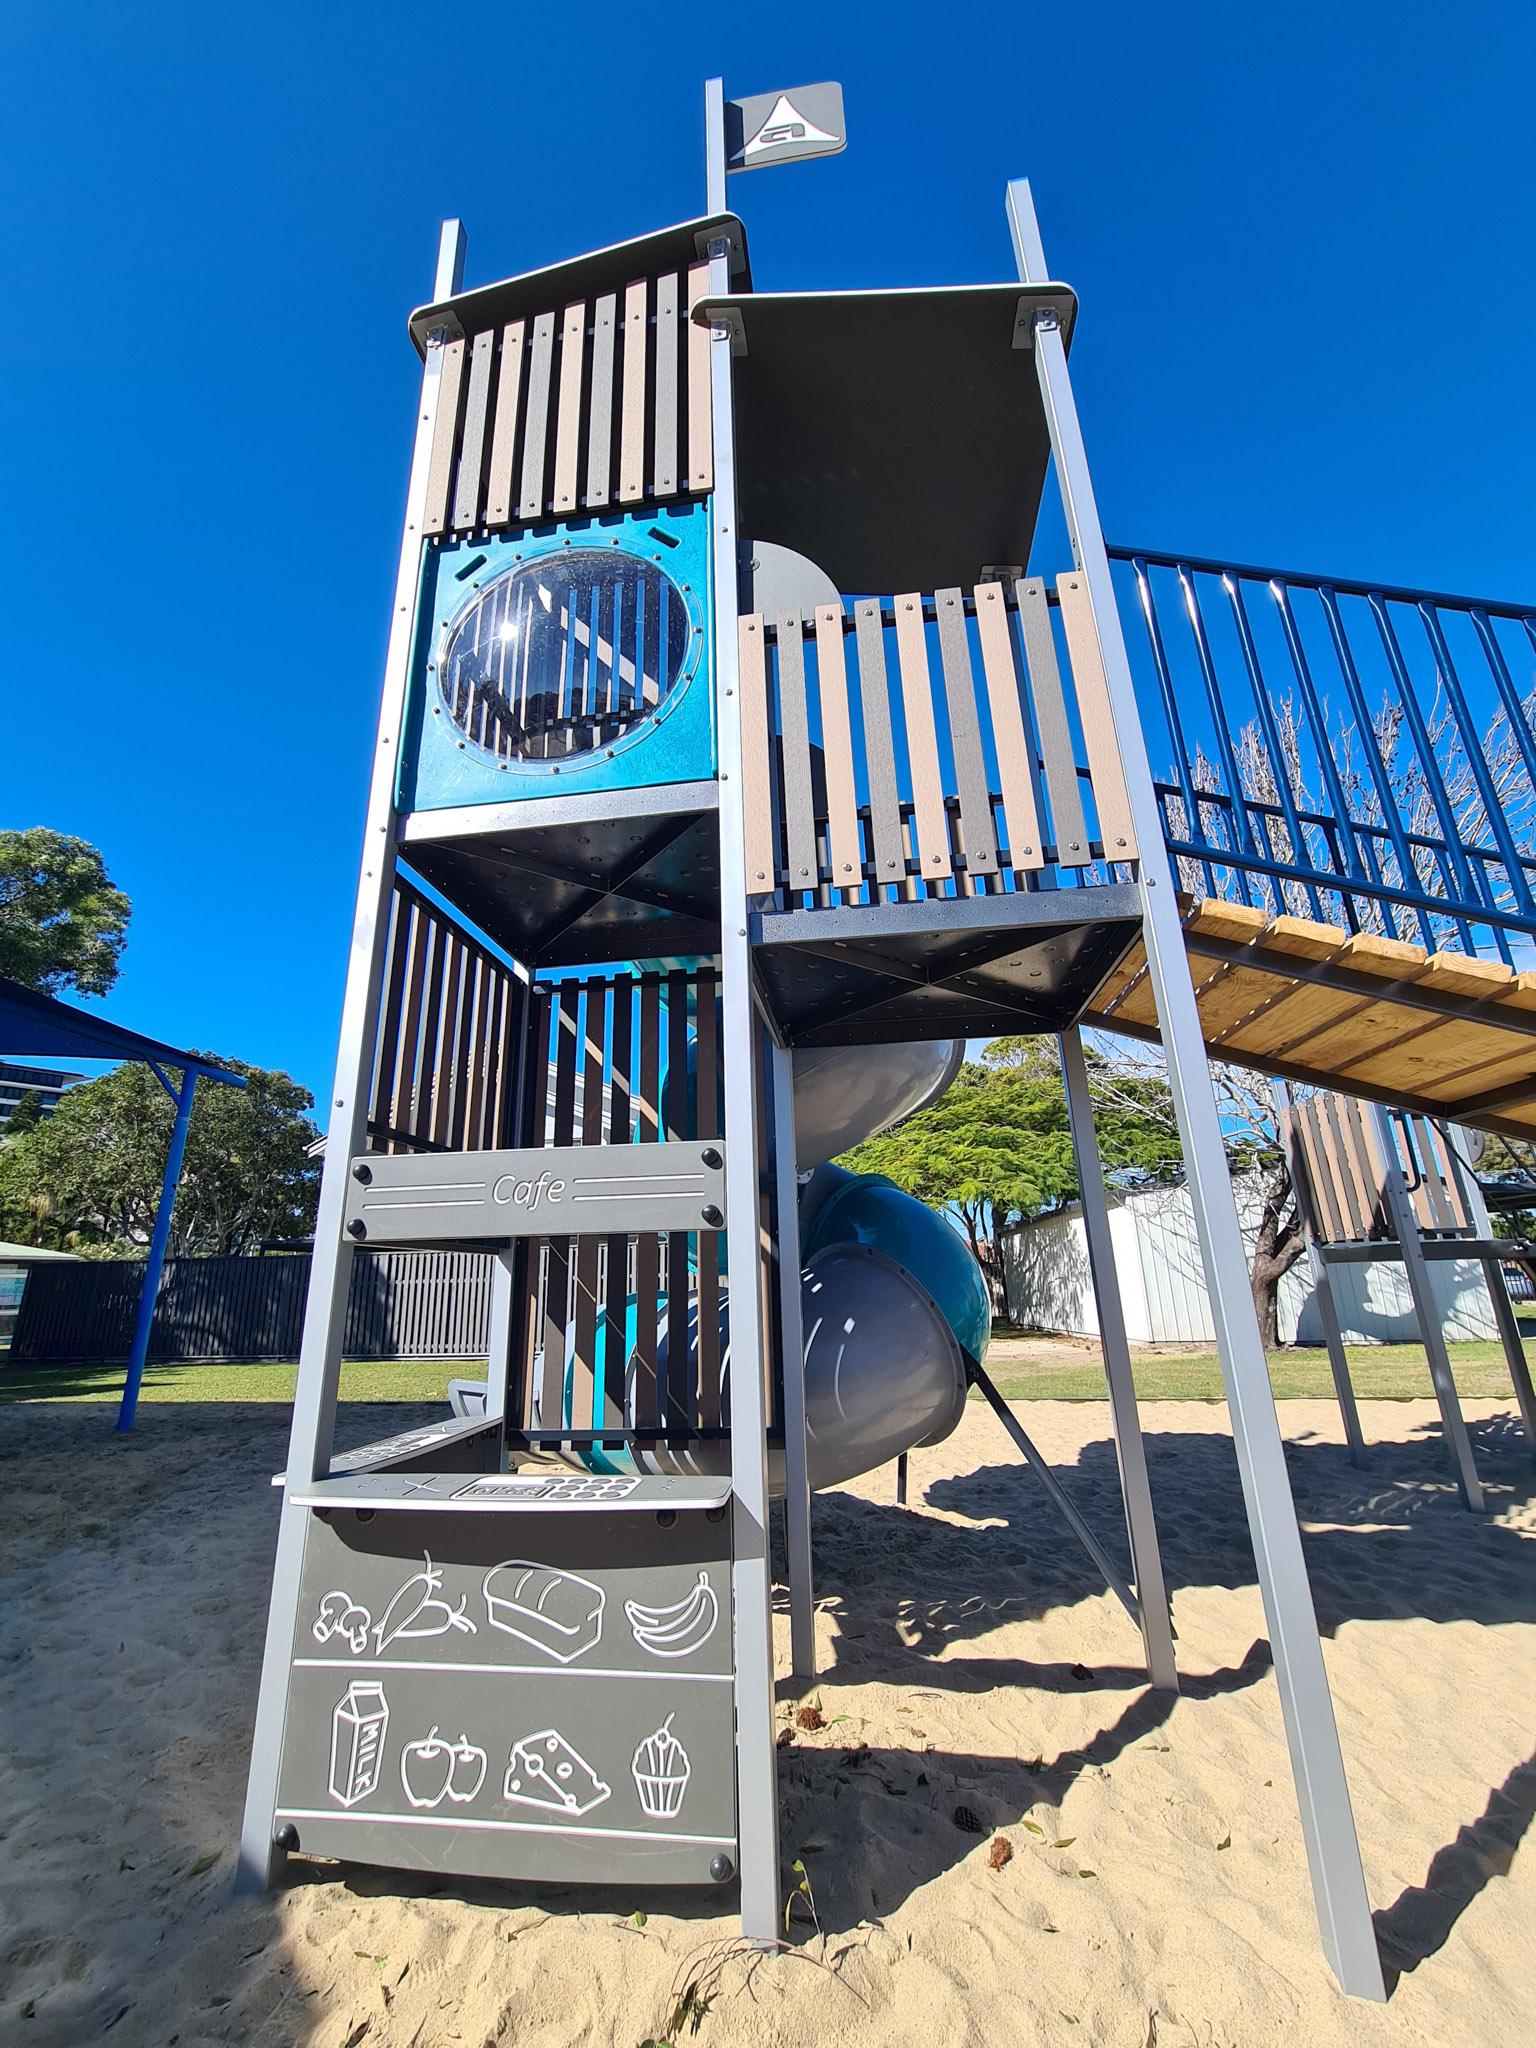 palm-beach-state-school-playrground-austek-play-10